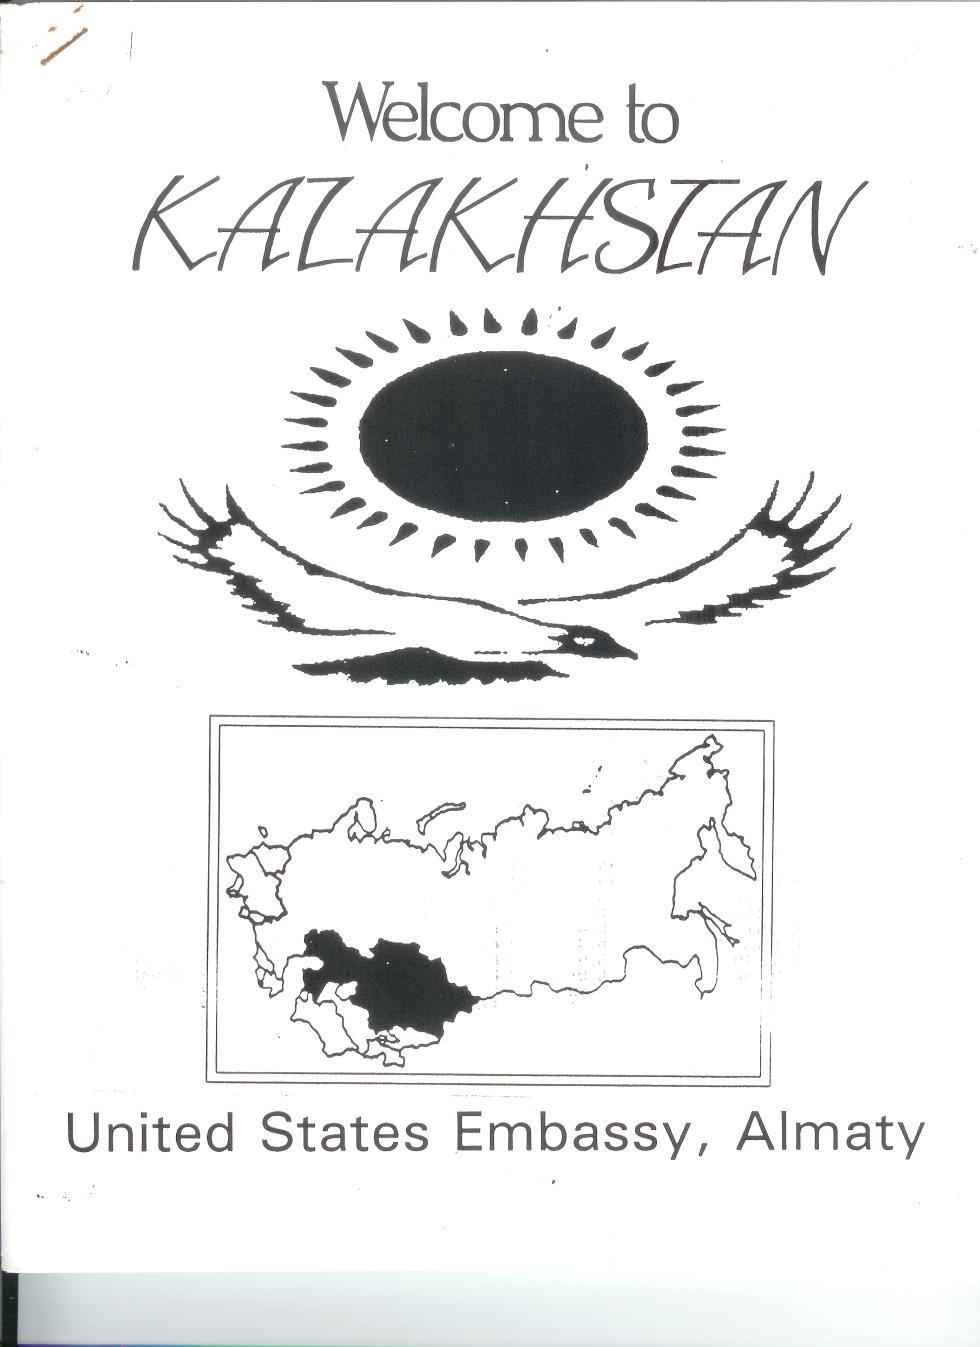 Welcome to Kazakhstan - U.S. Embassy